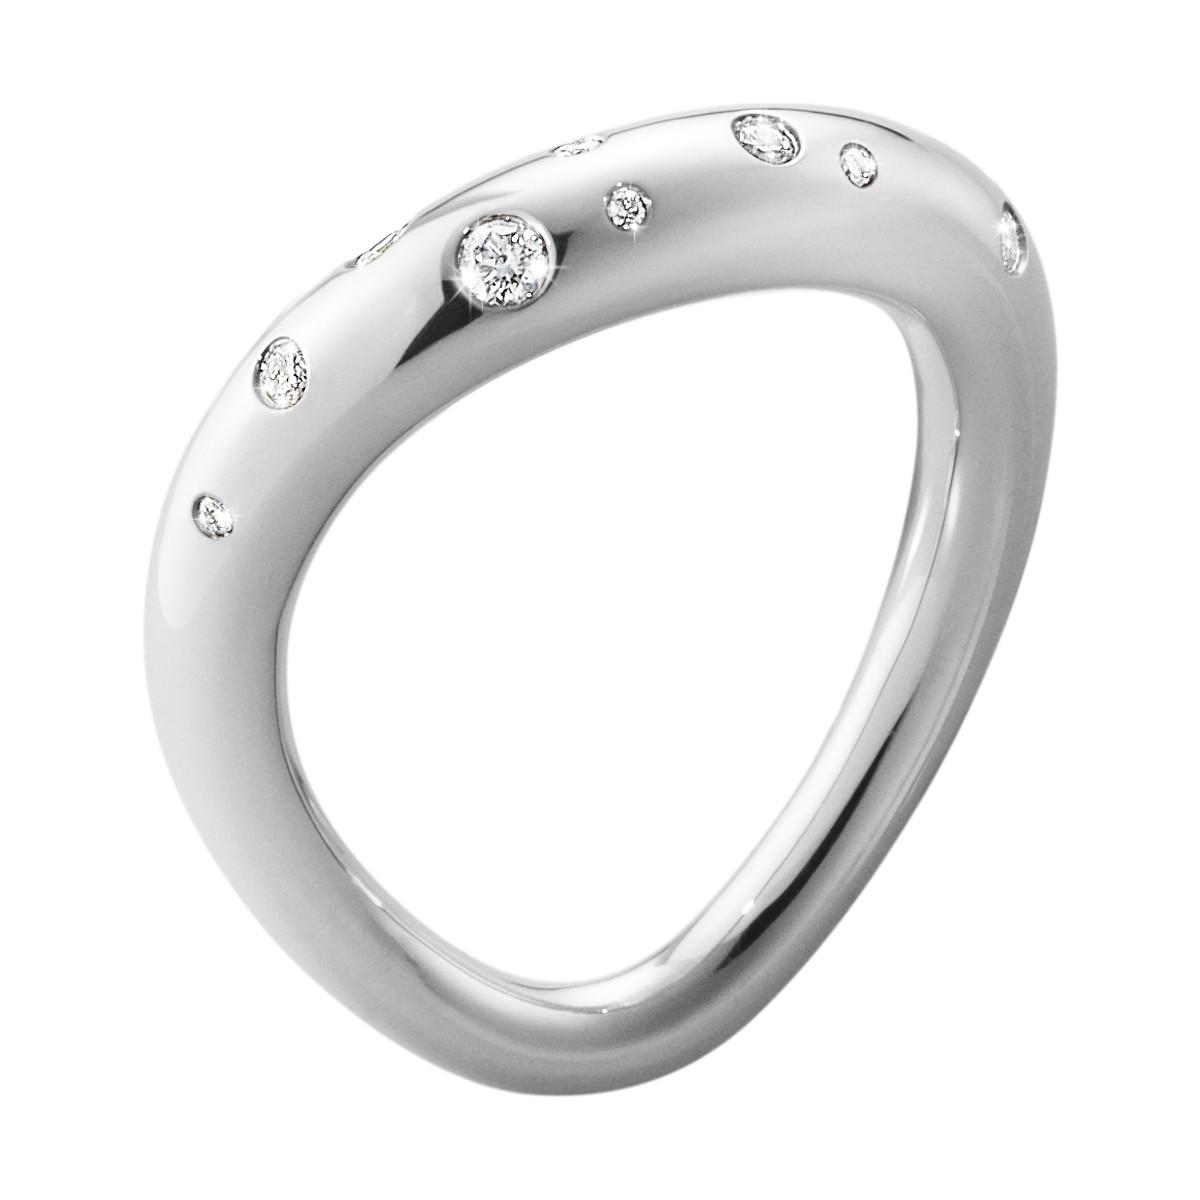 Georg Jensen OFFSPRING ring - 10013251 Sølv / 0.14 ct 2